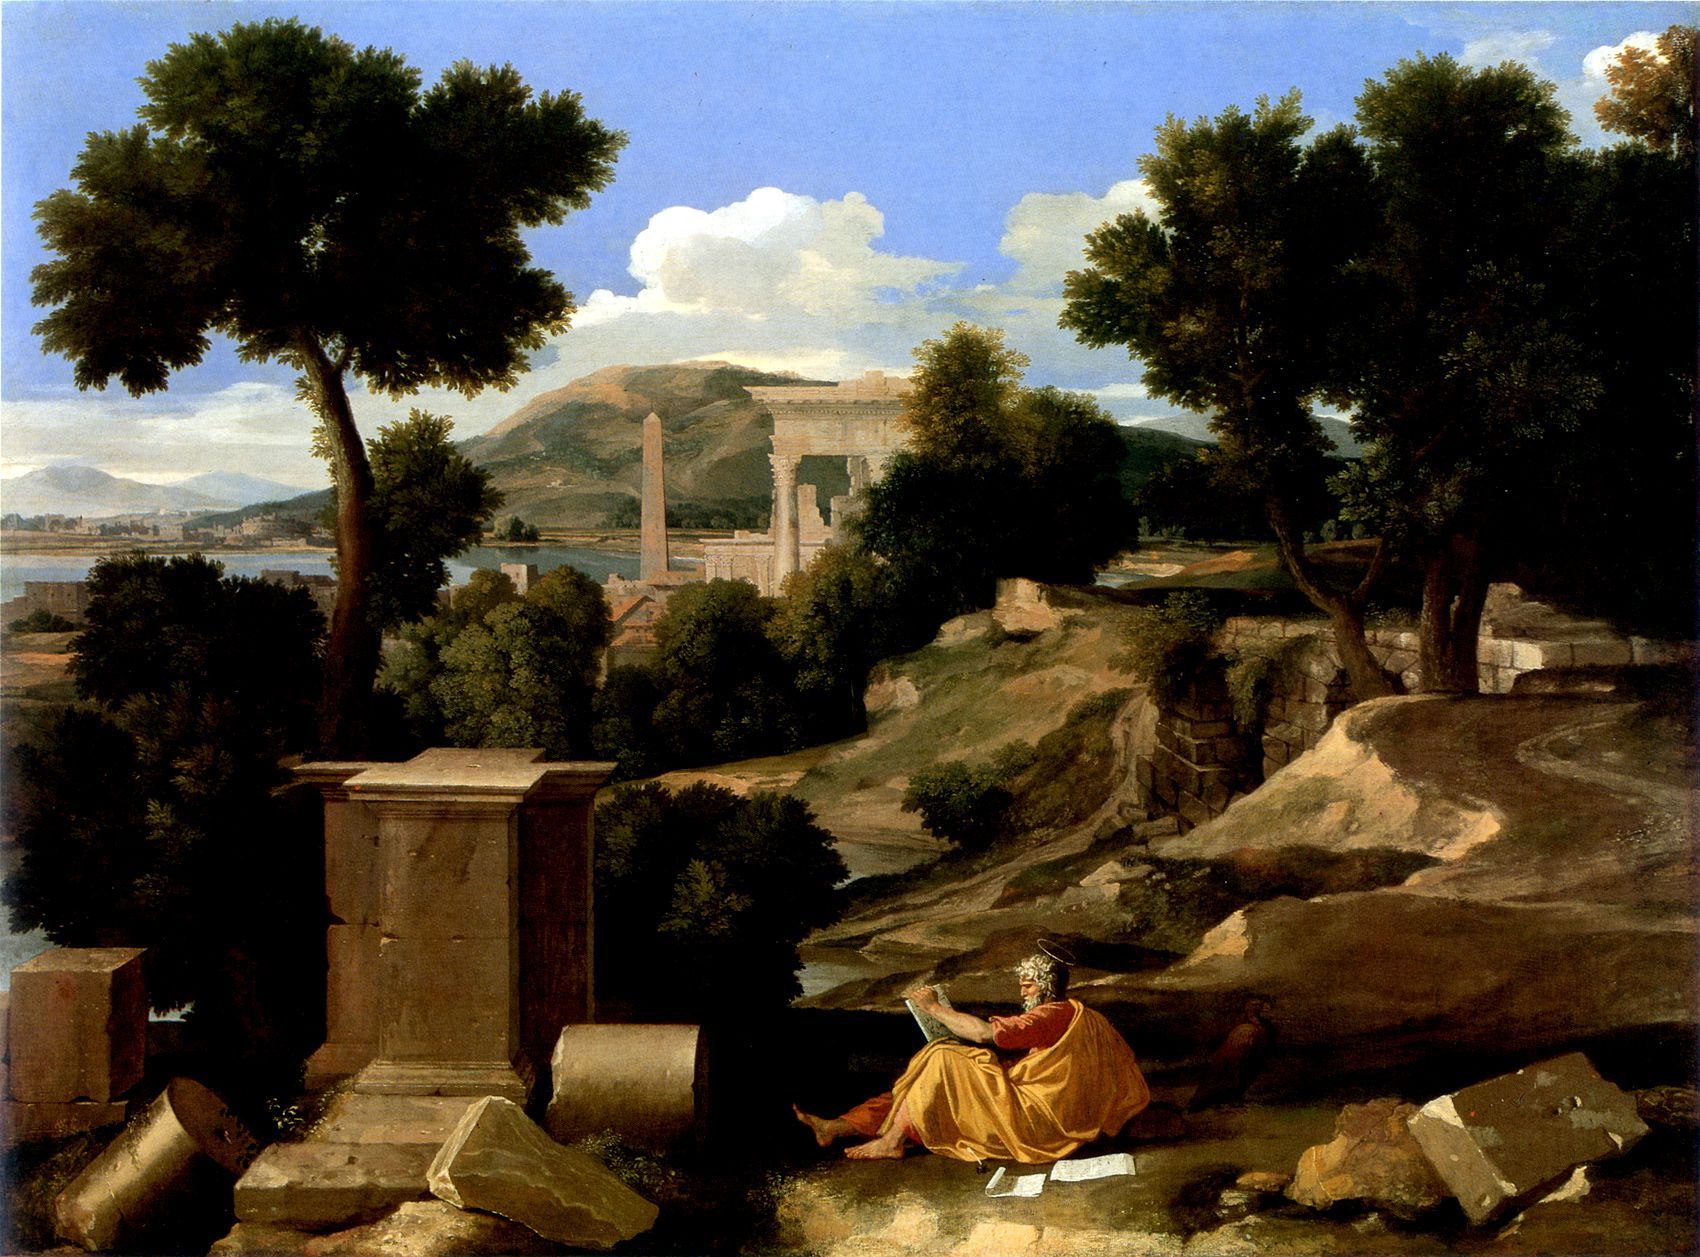 Nicolas Poussin. Landscape With St. John Patmos. 1640. Oil Canvas. Art Institute Of